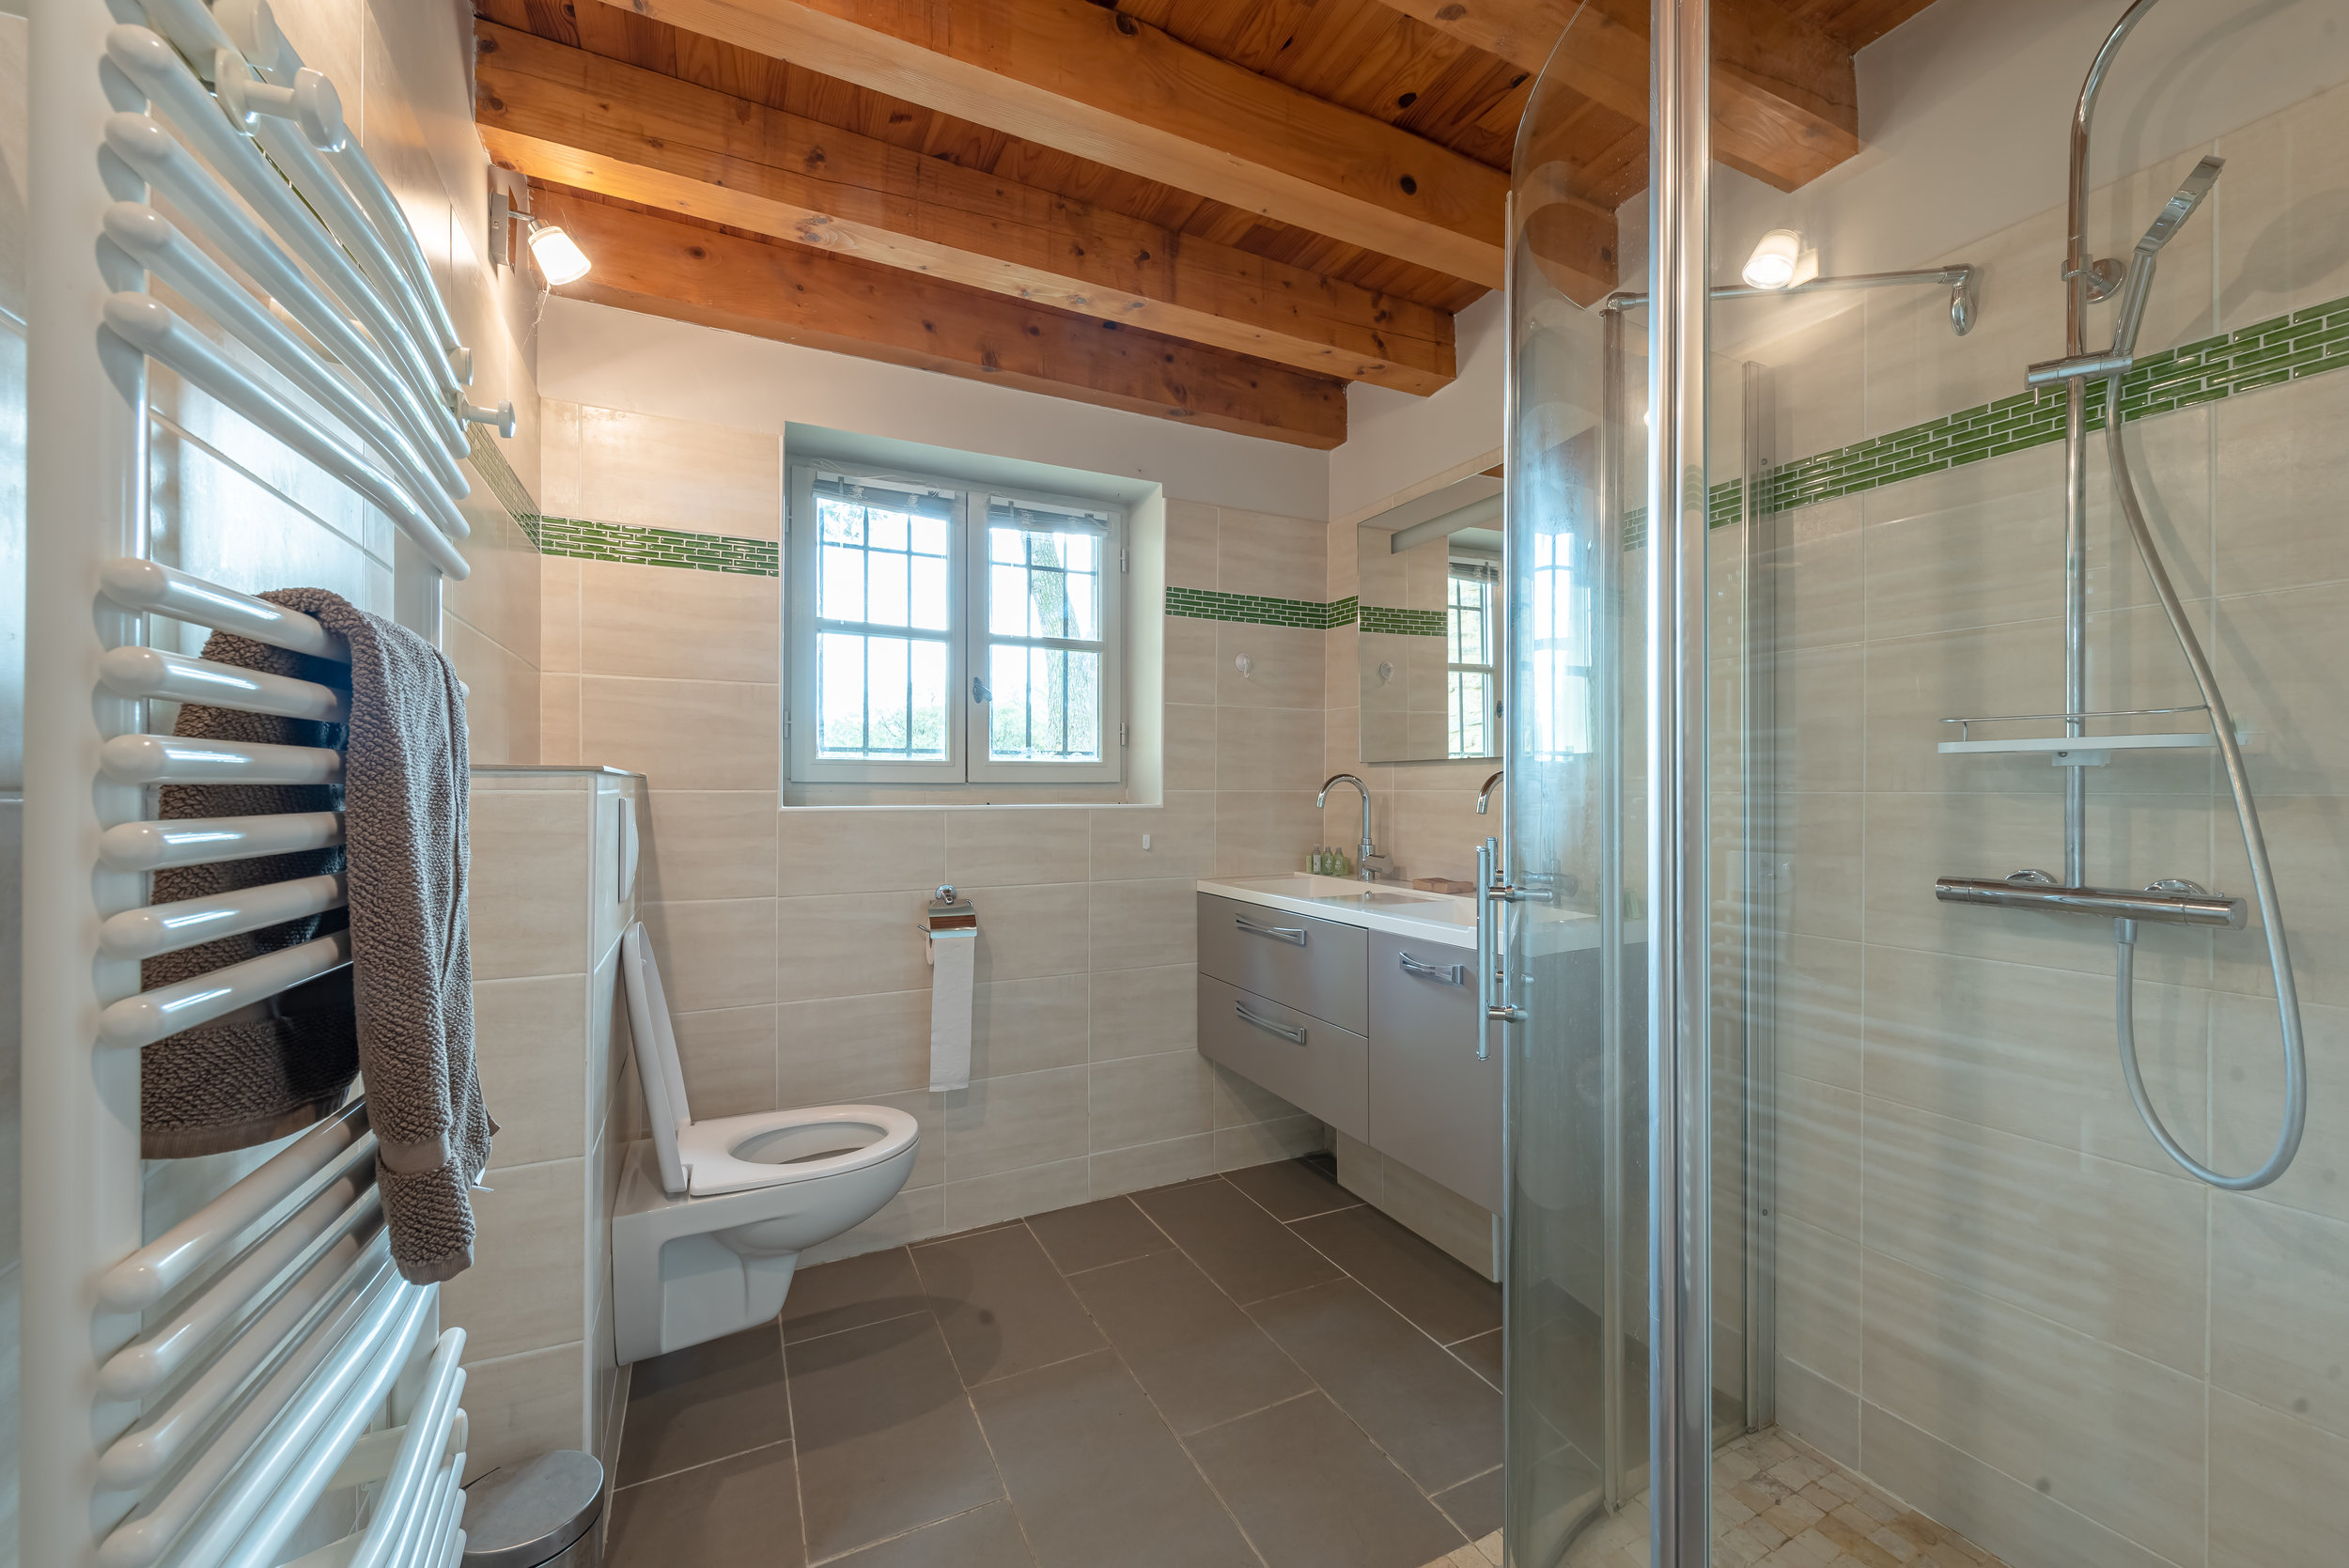 Moulin bathroom.jpg